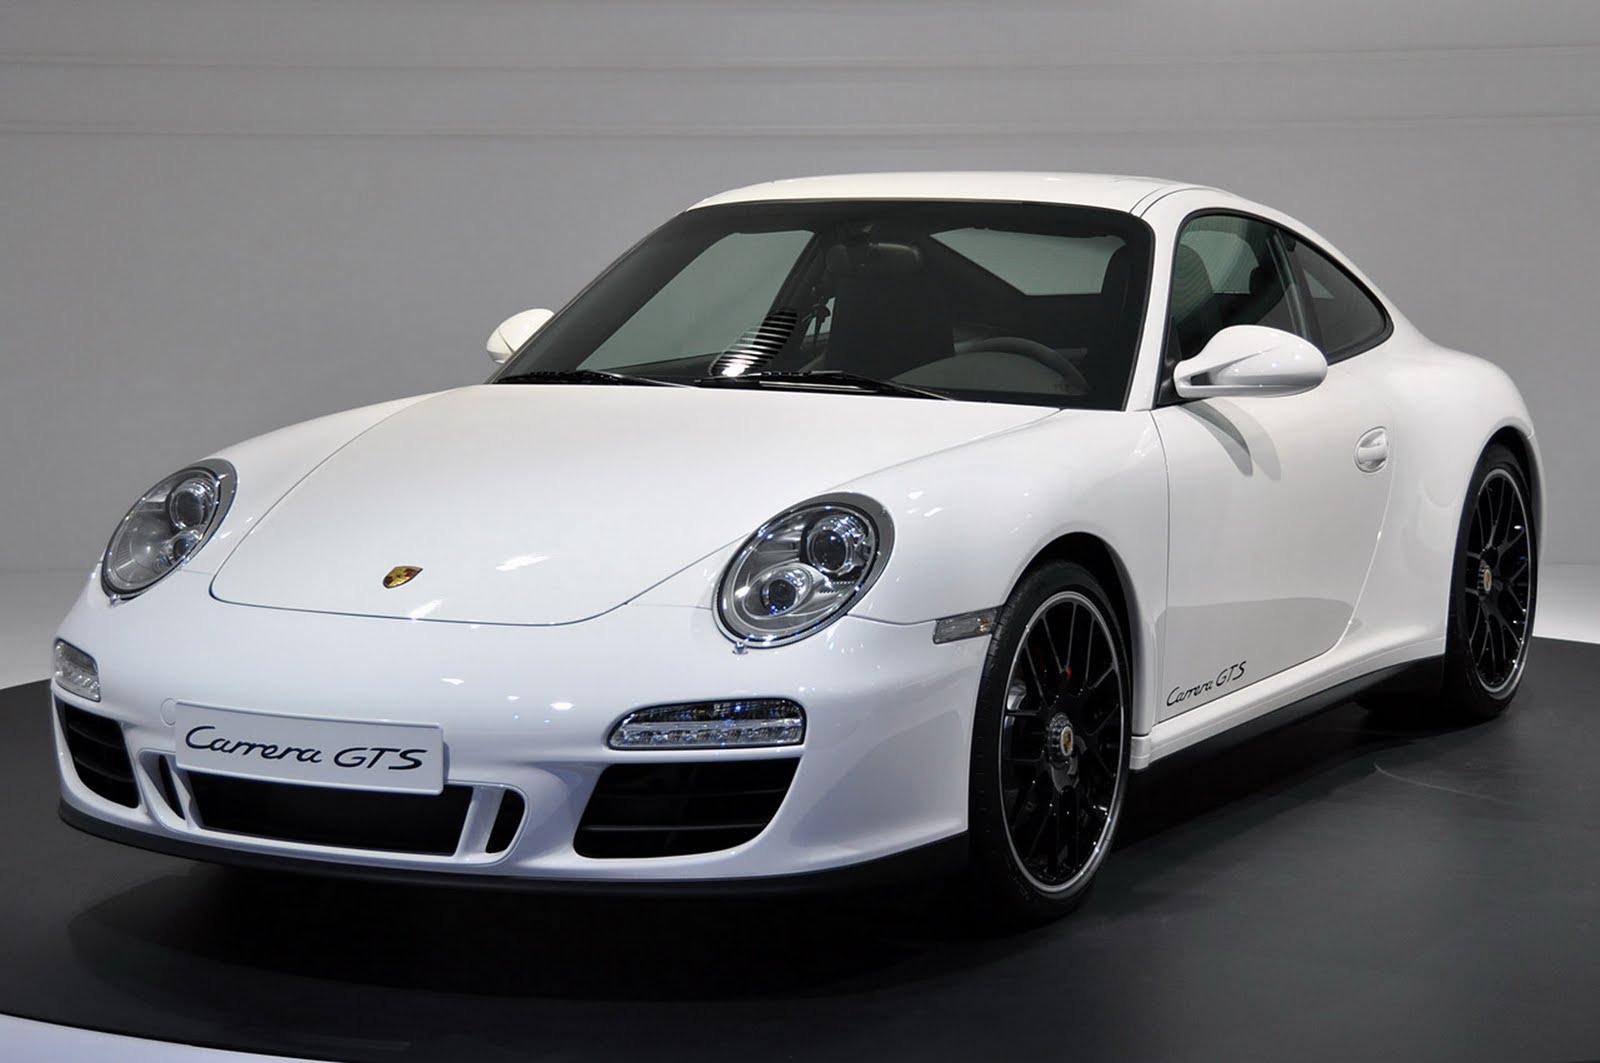 topgearwithmustafa 2011 porsche 911 carrera gts. Black Bedroom Furniture Sets. Home Design Ideas